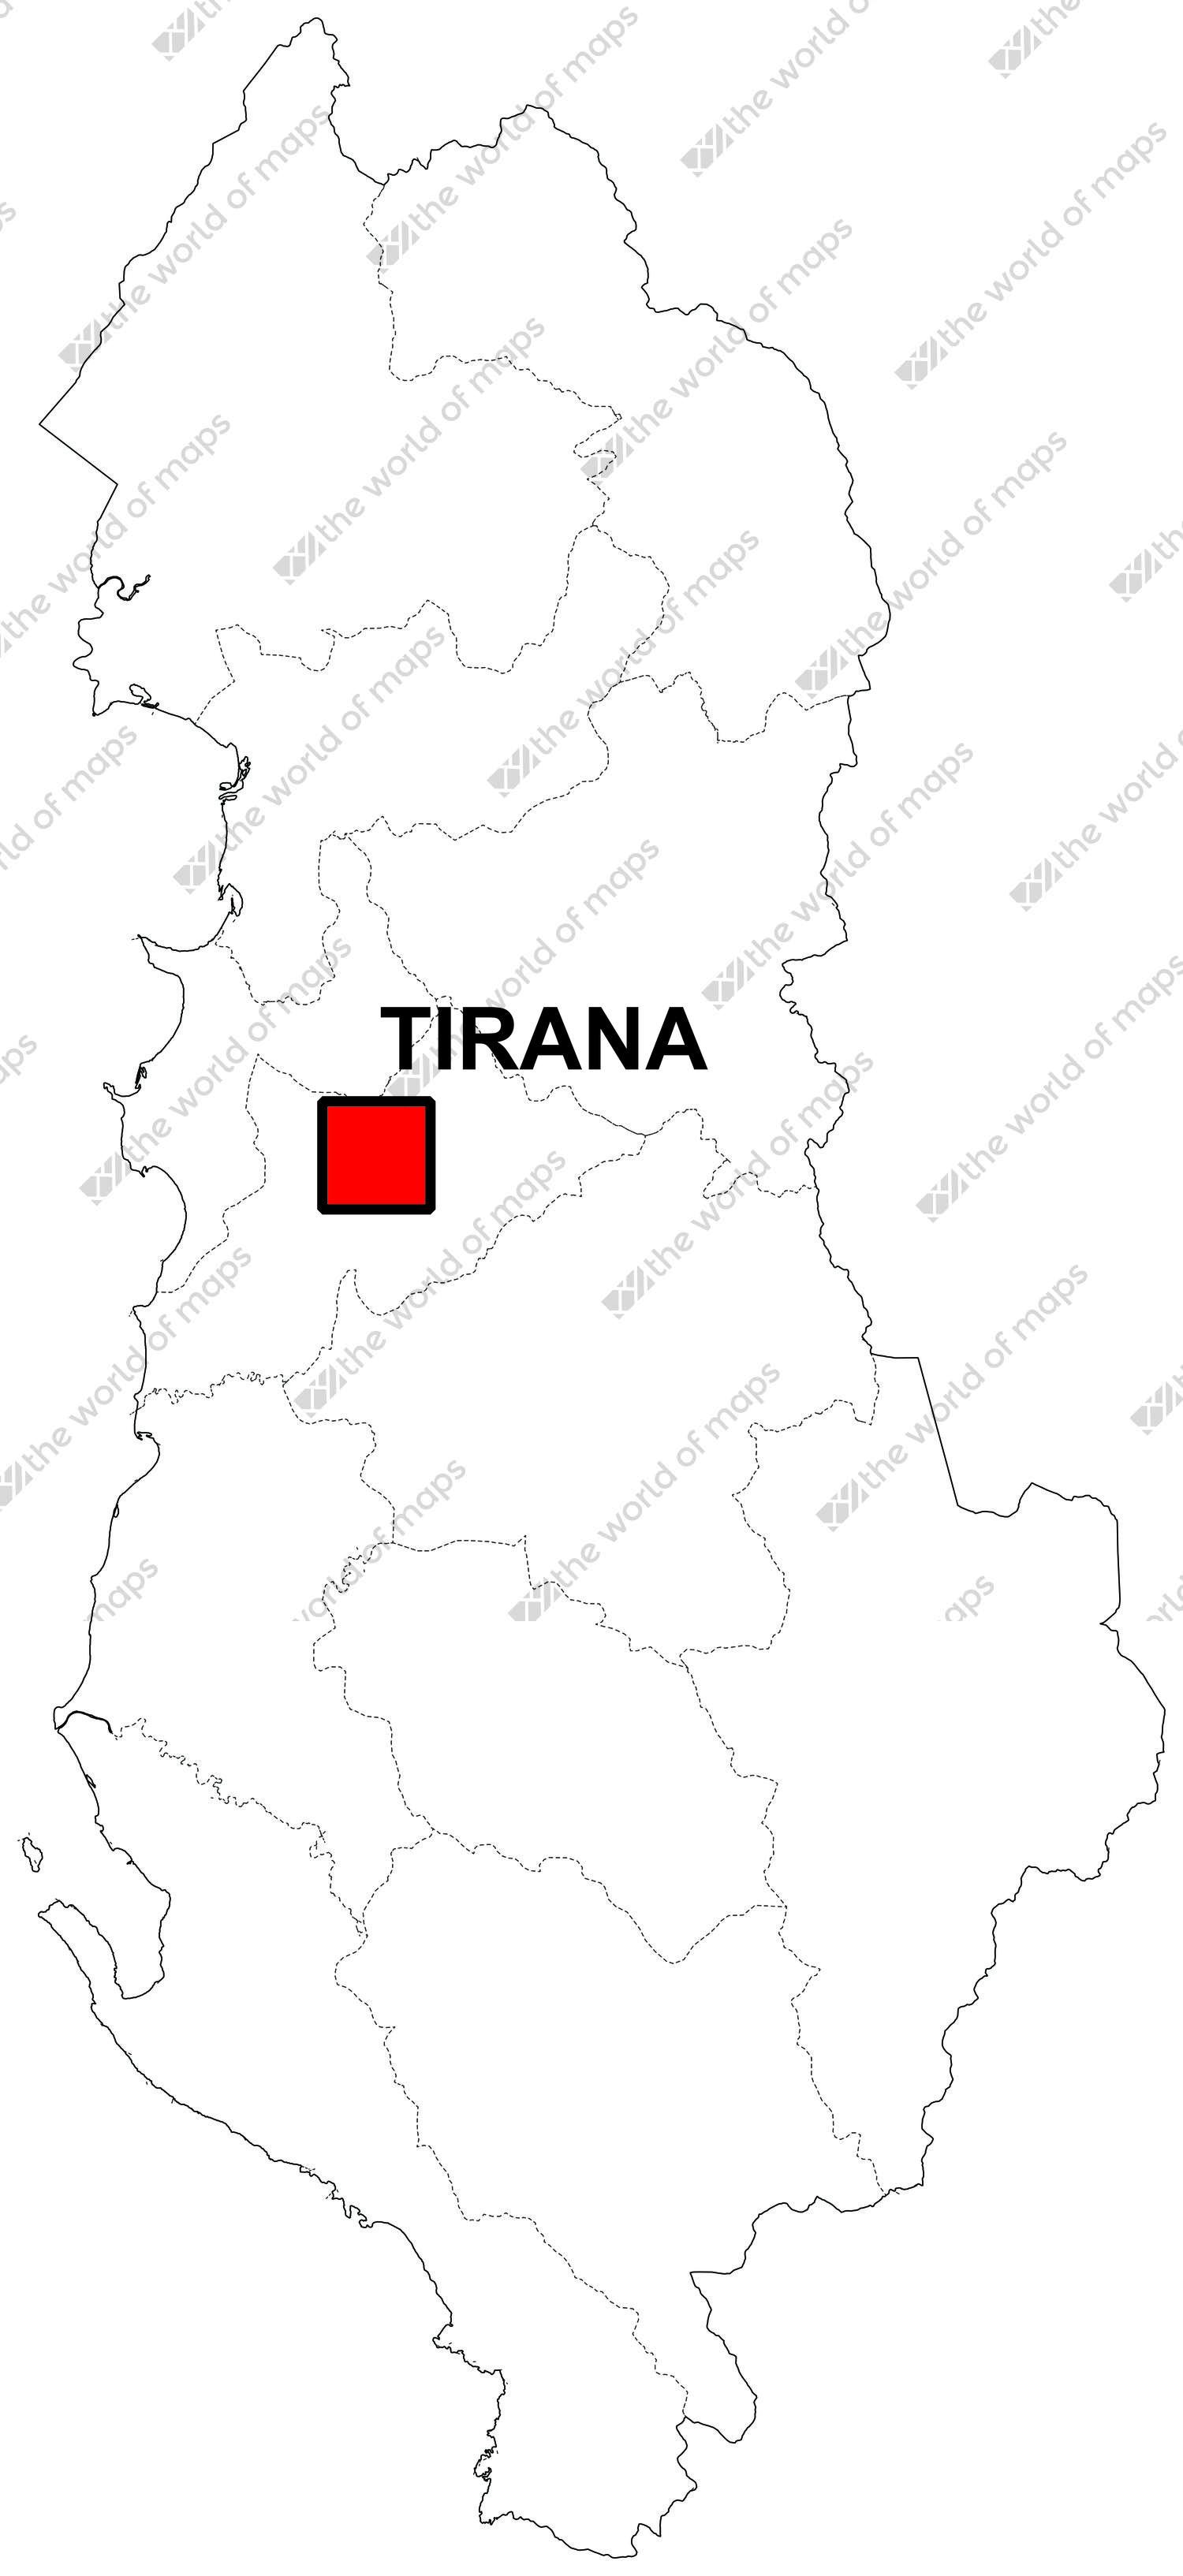 Free Digital Map Of Albania The World Of Maps Com